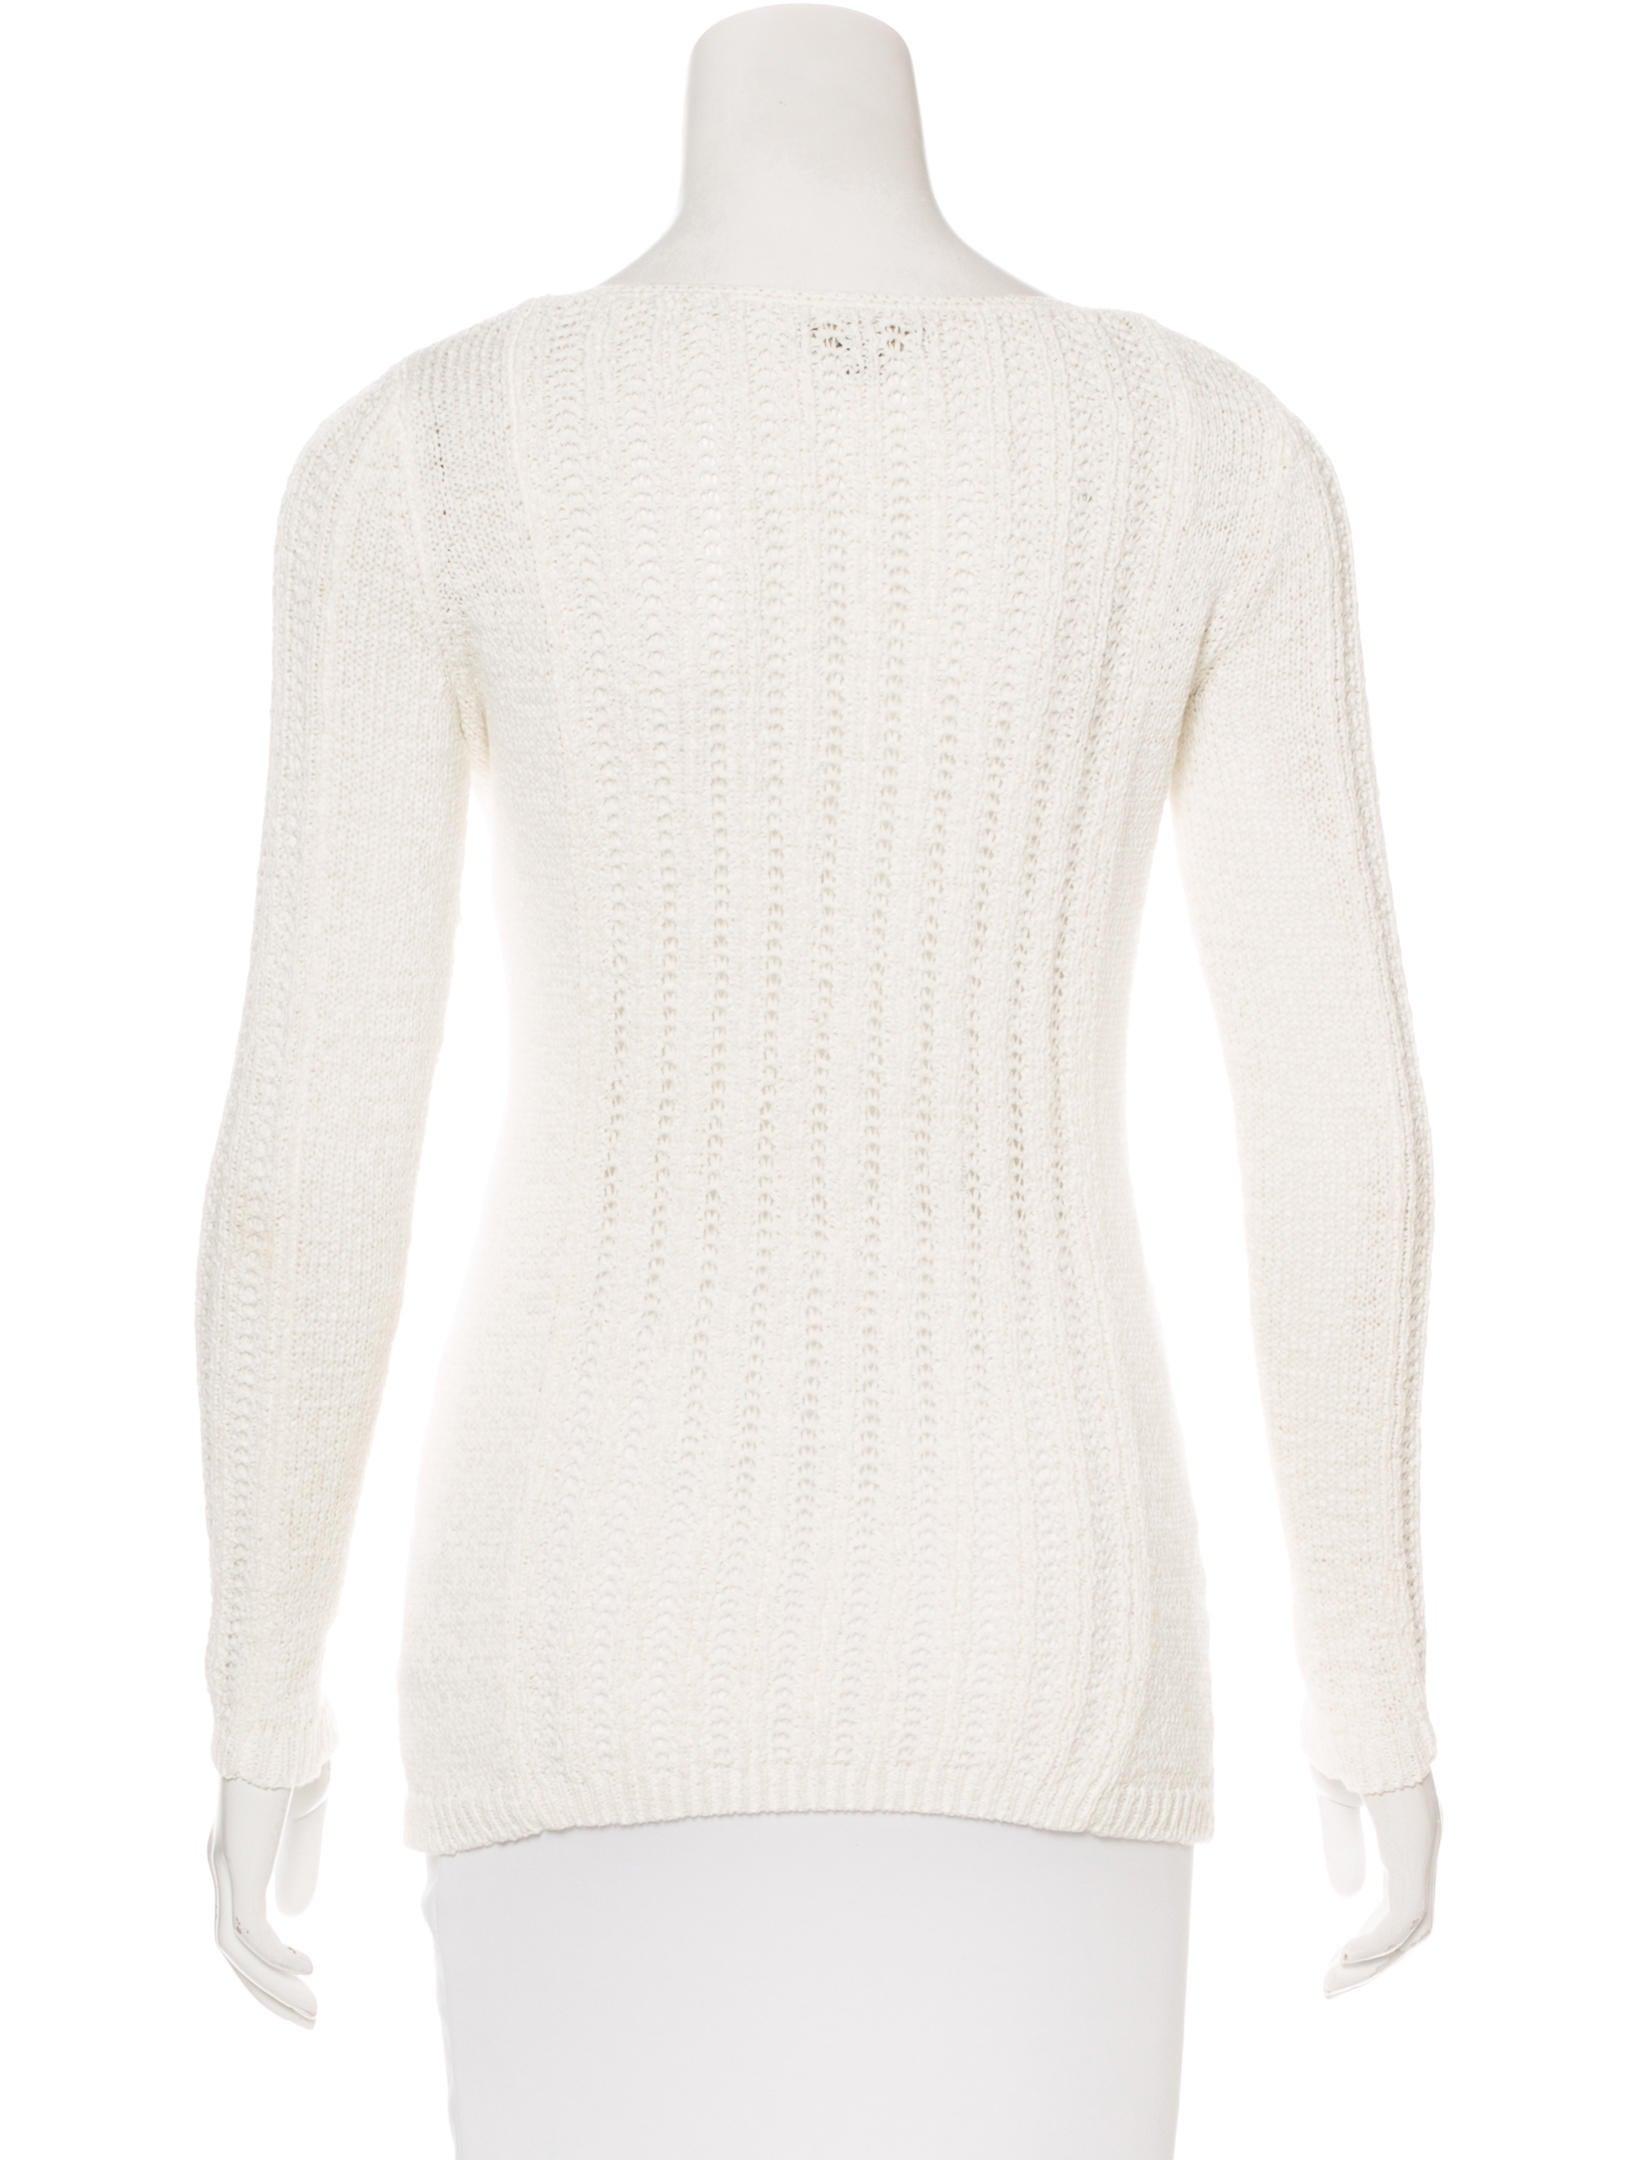 Rachel Zoe Open Knit Scoop Neck Sweater - Clothing - WRL28222 The RealReal